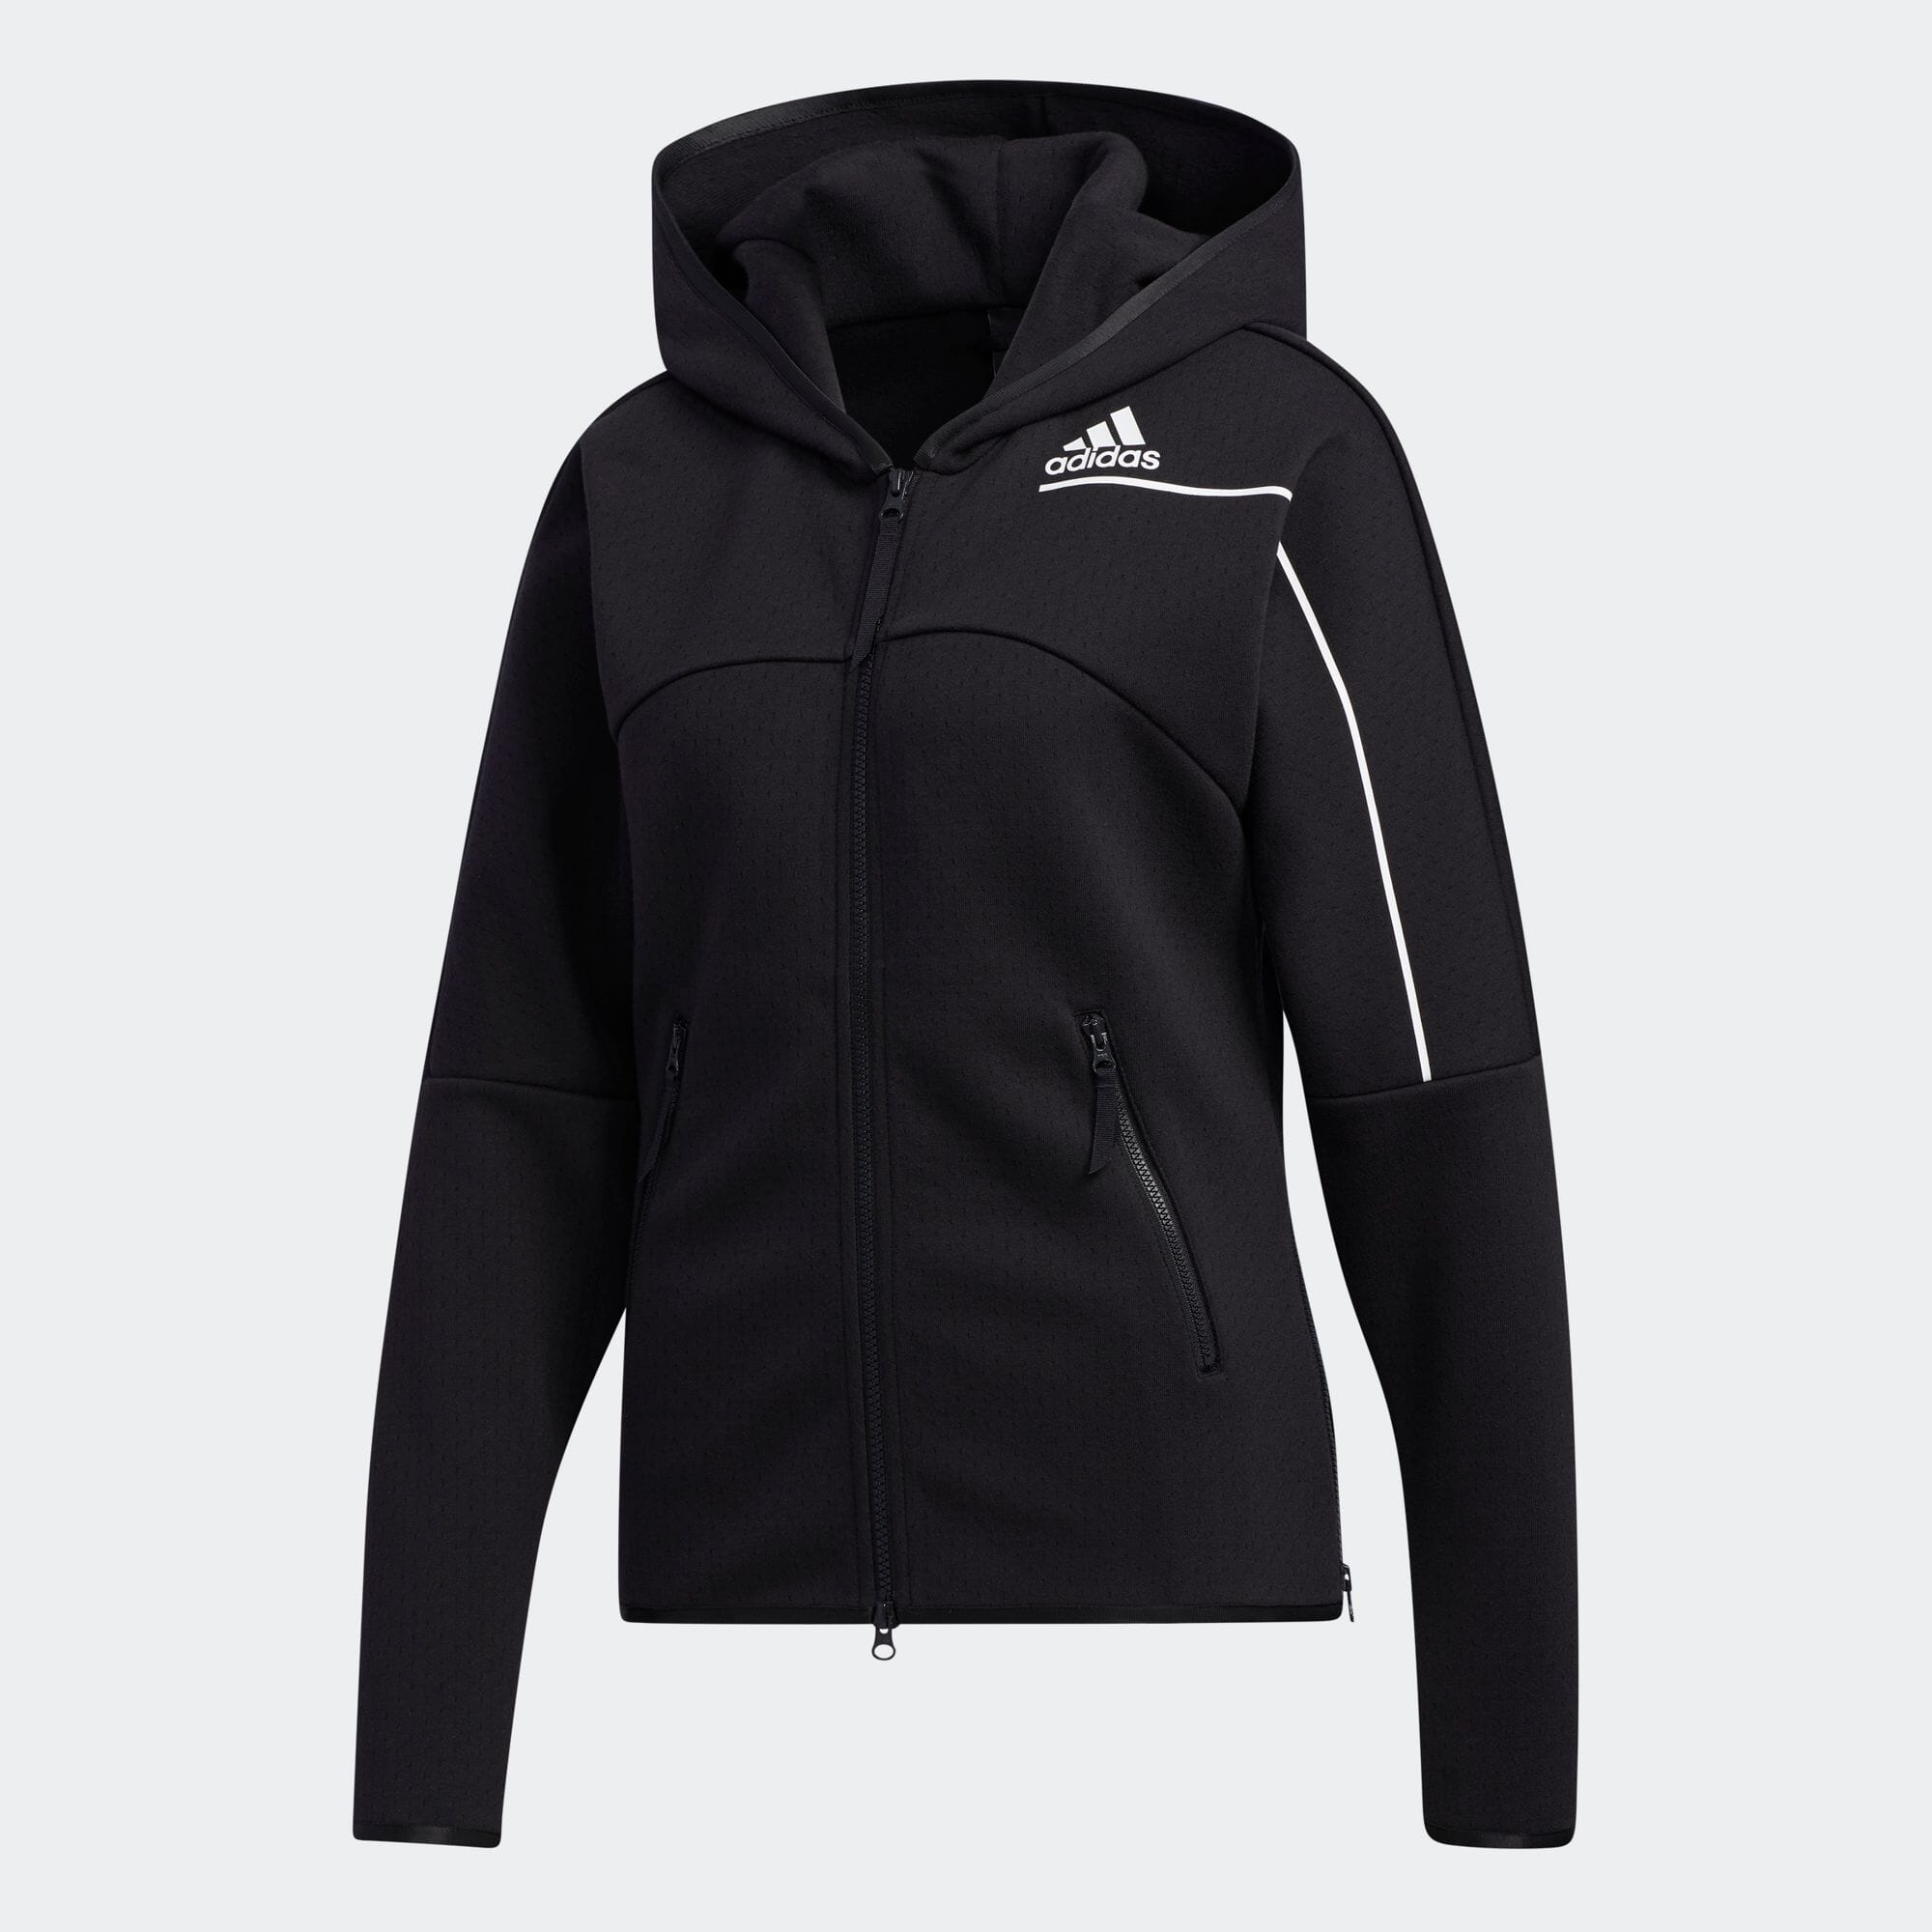 adidas Z.N.E. ジャパン フーディー / adidas Z.N.E. Japan Hoodie